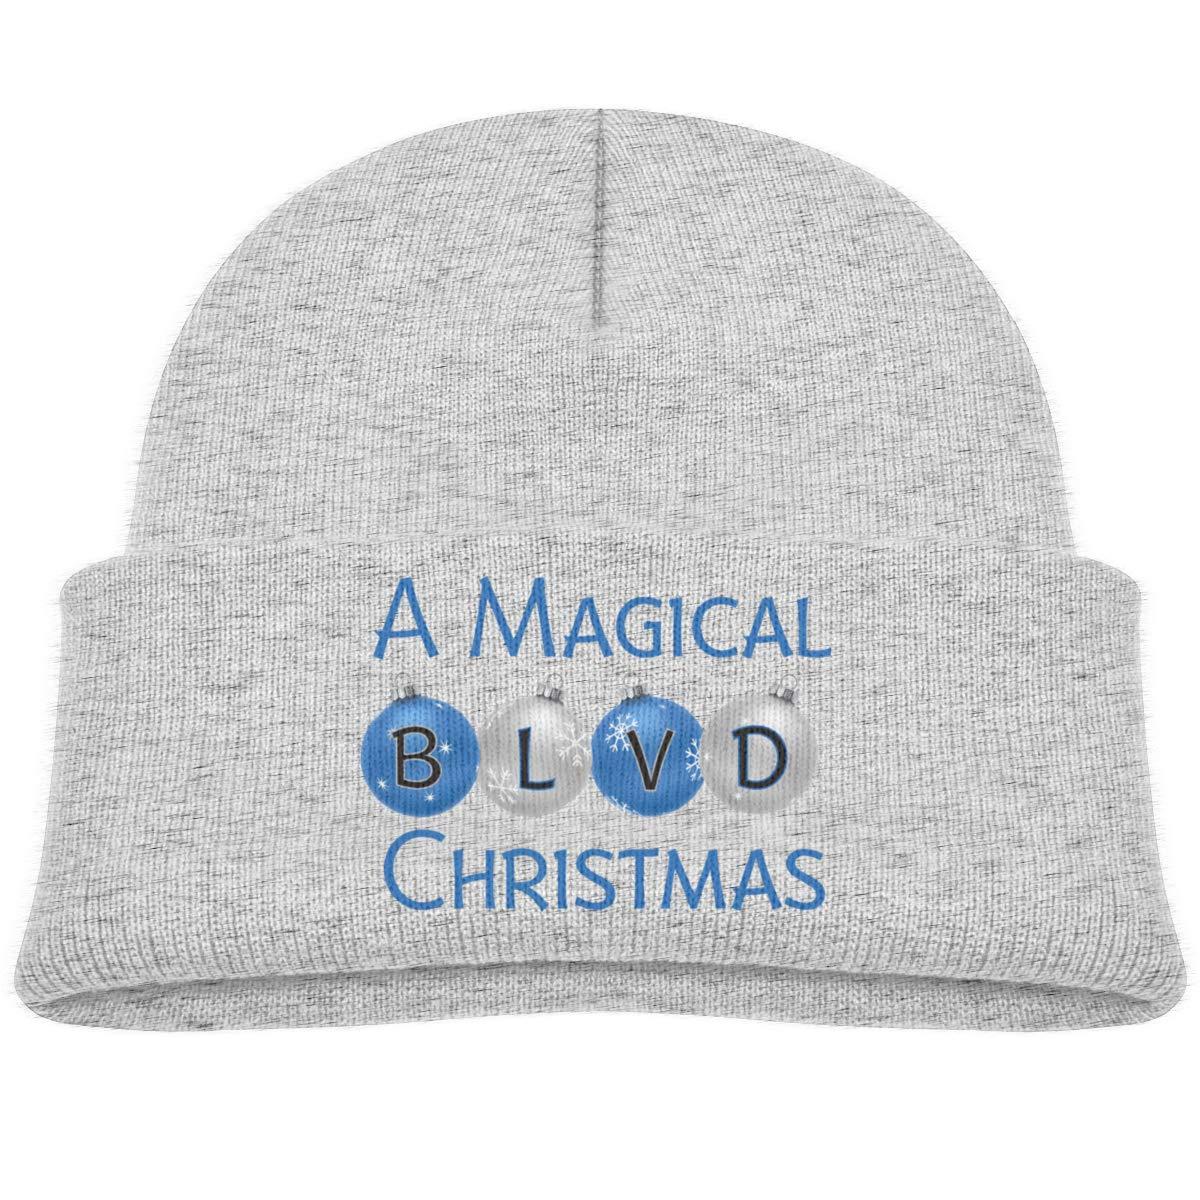 A Magical BLVD Christmas Infant Knit Hats Unisex Beanies Cap